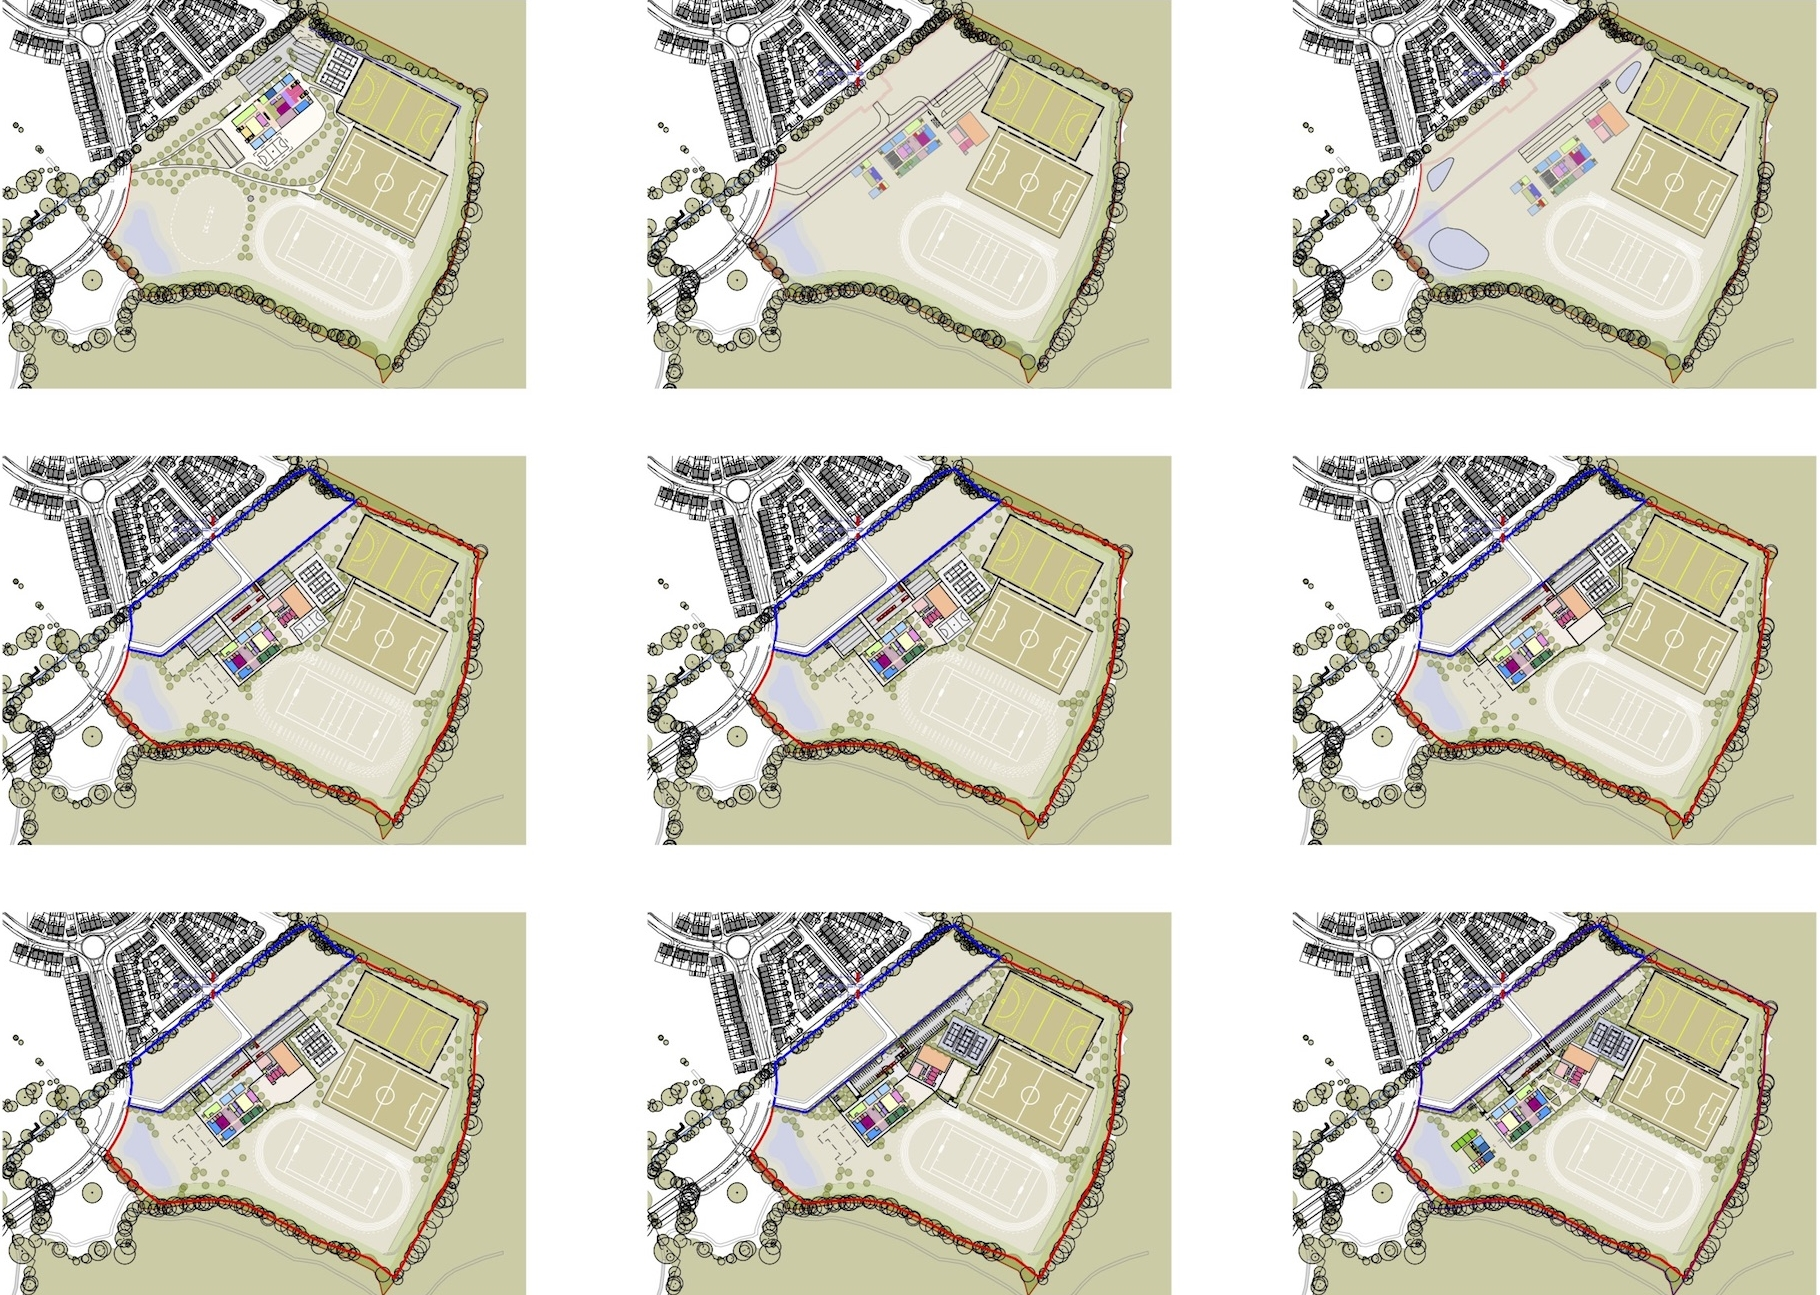 North Whiteley new ESFA school design options.jpg